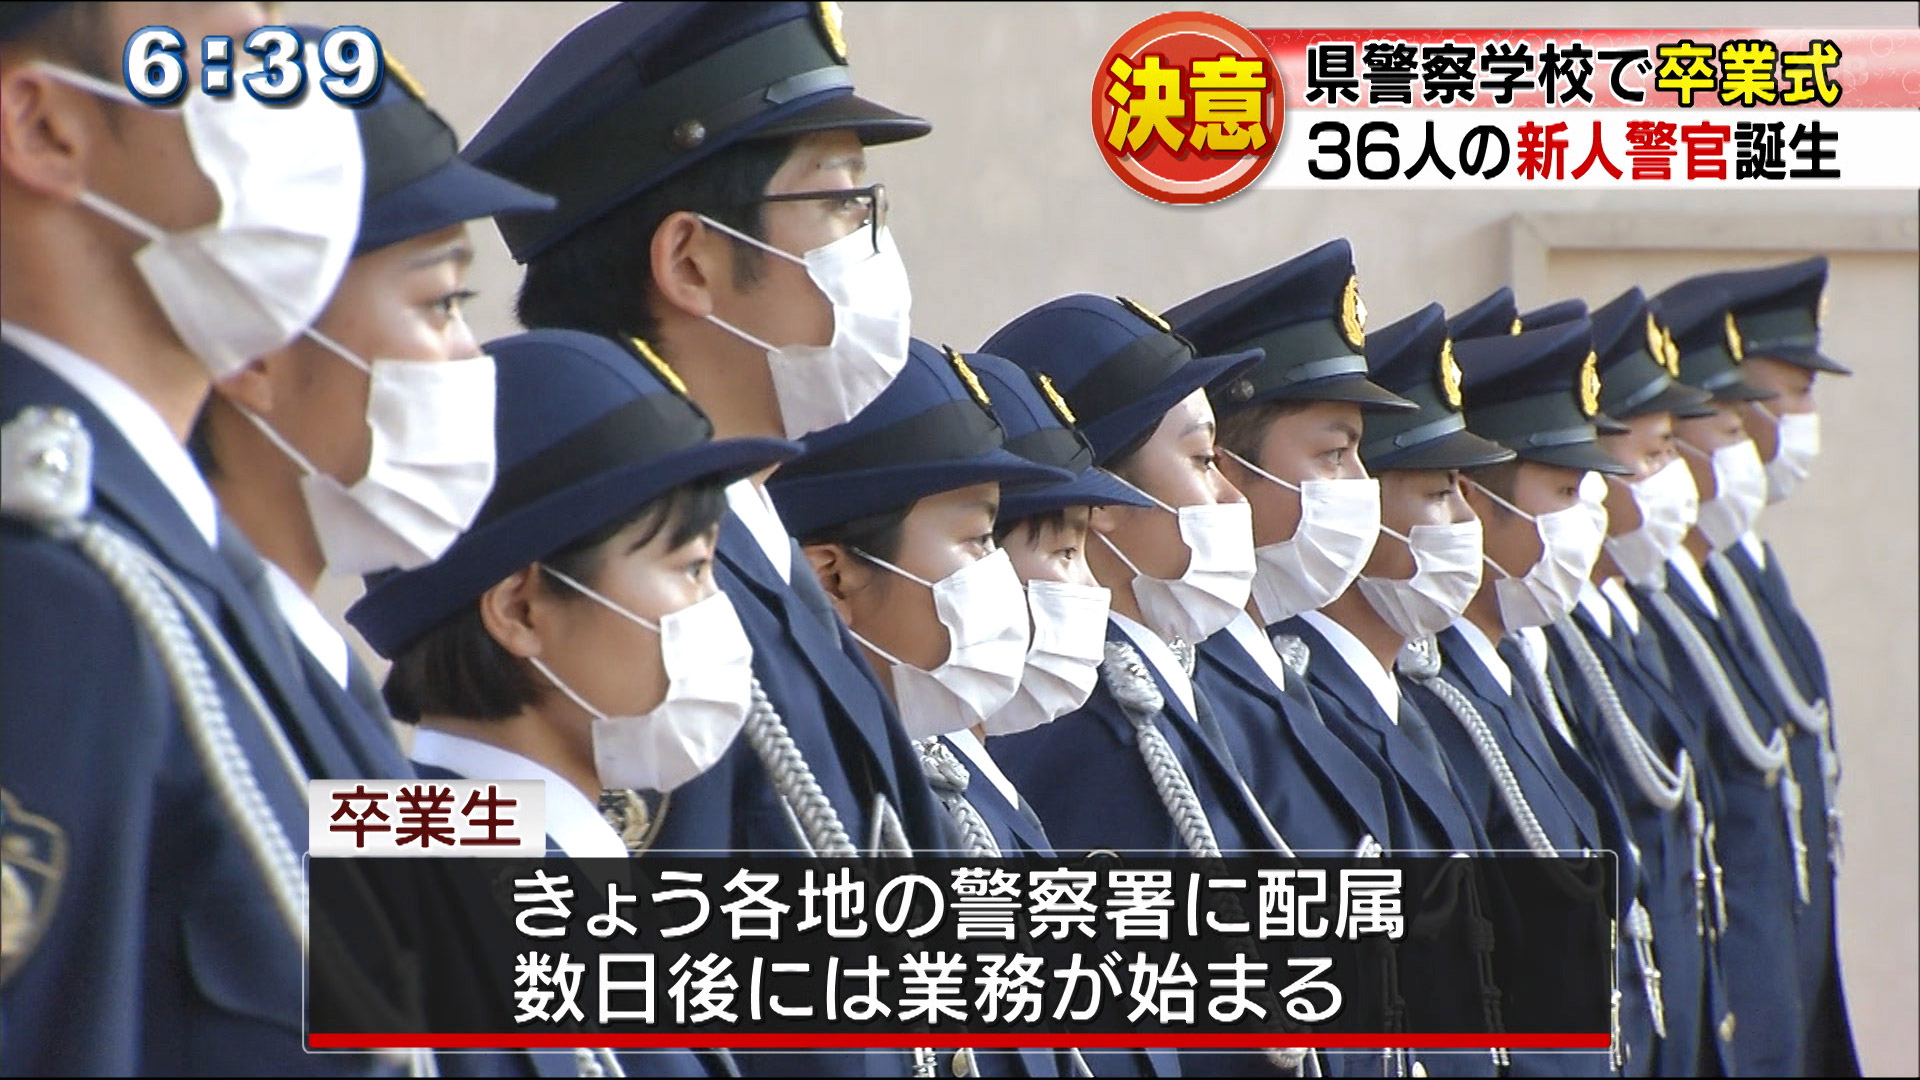 県警察学校で卒業式 36人の新人警官誕生